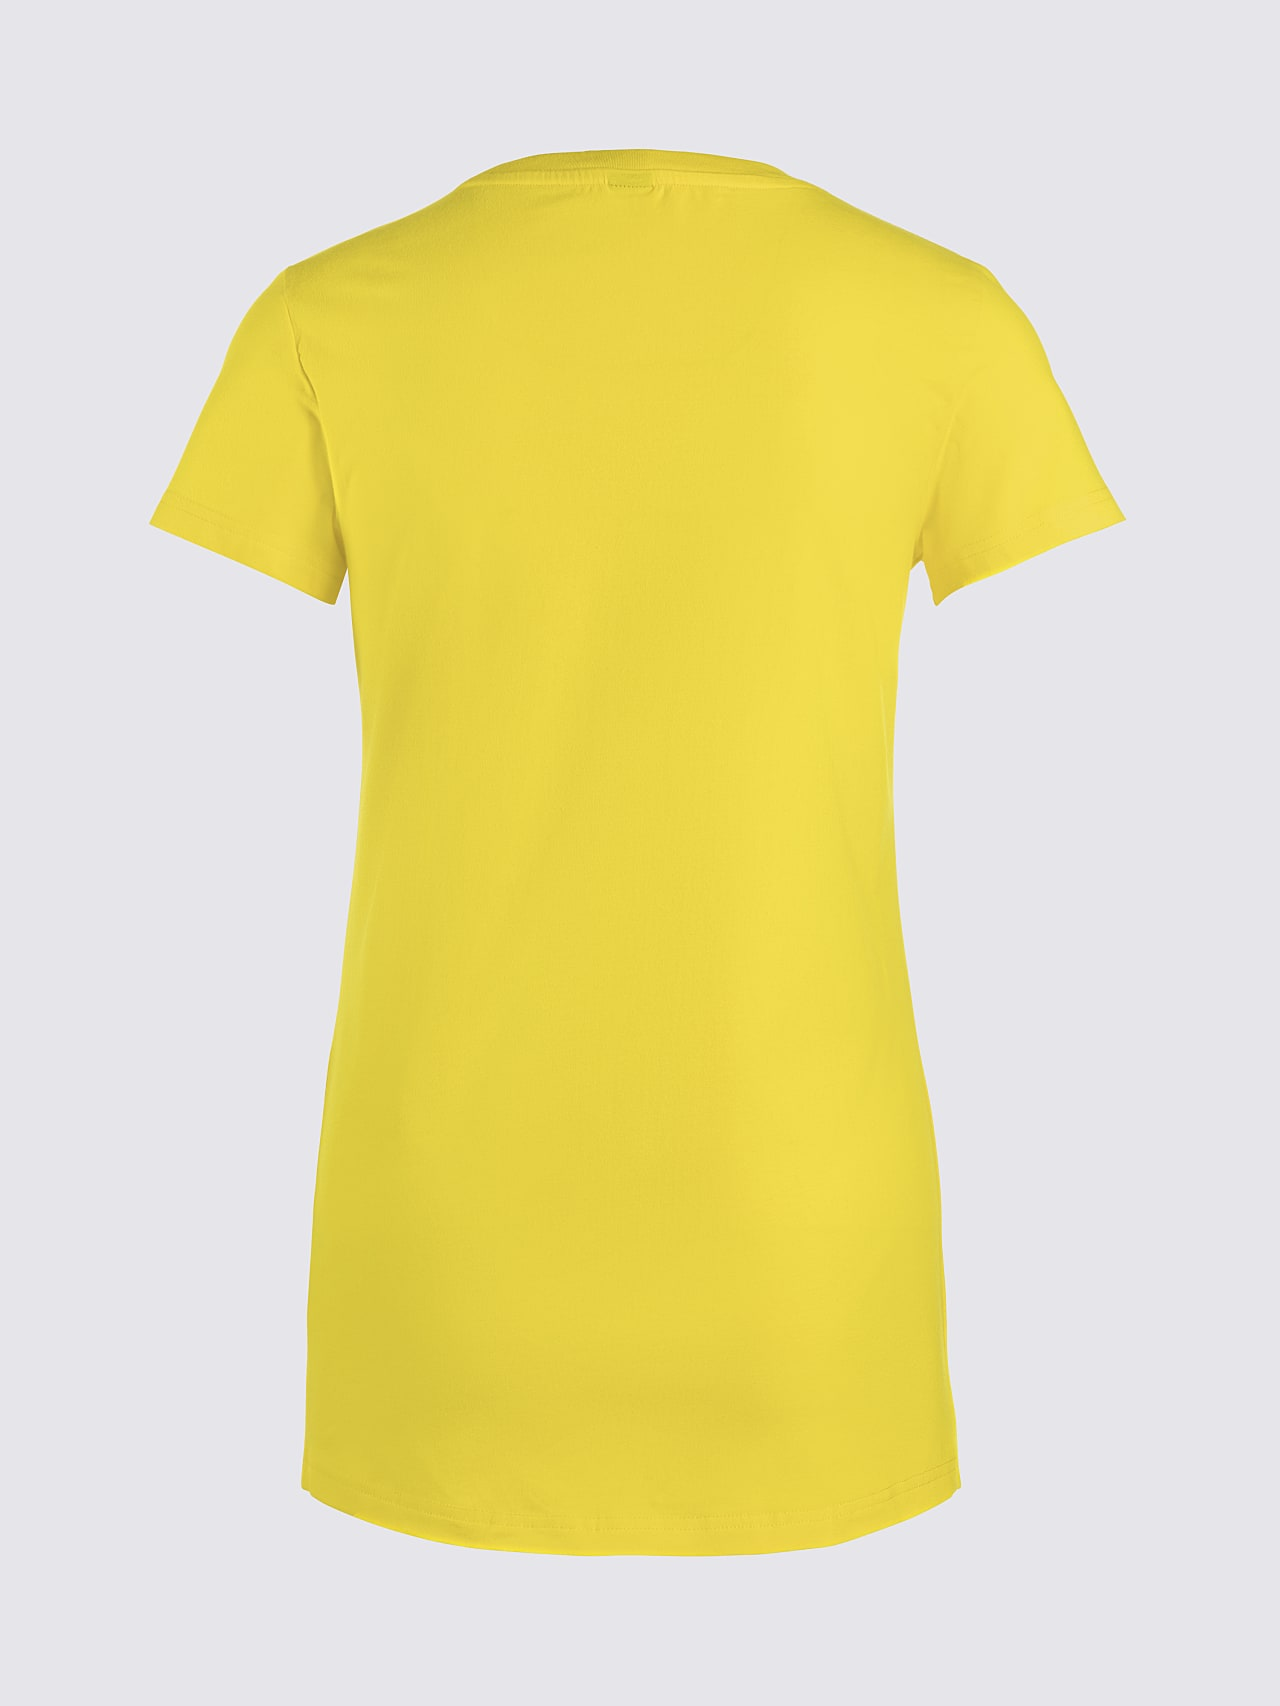 JERU V2.Y4.02 Signature Logo T-Shirt yellow Left Alpha Tauri